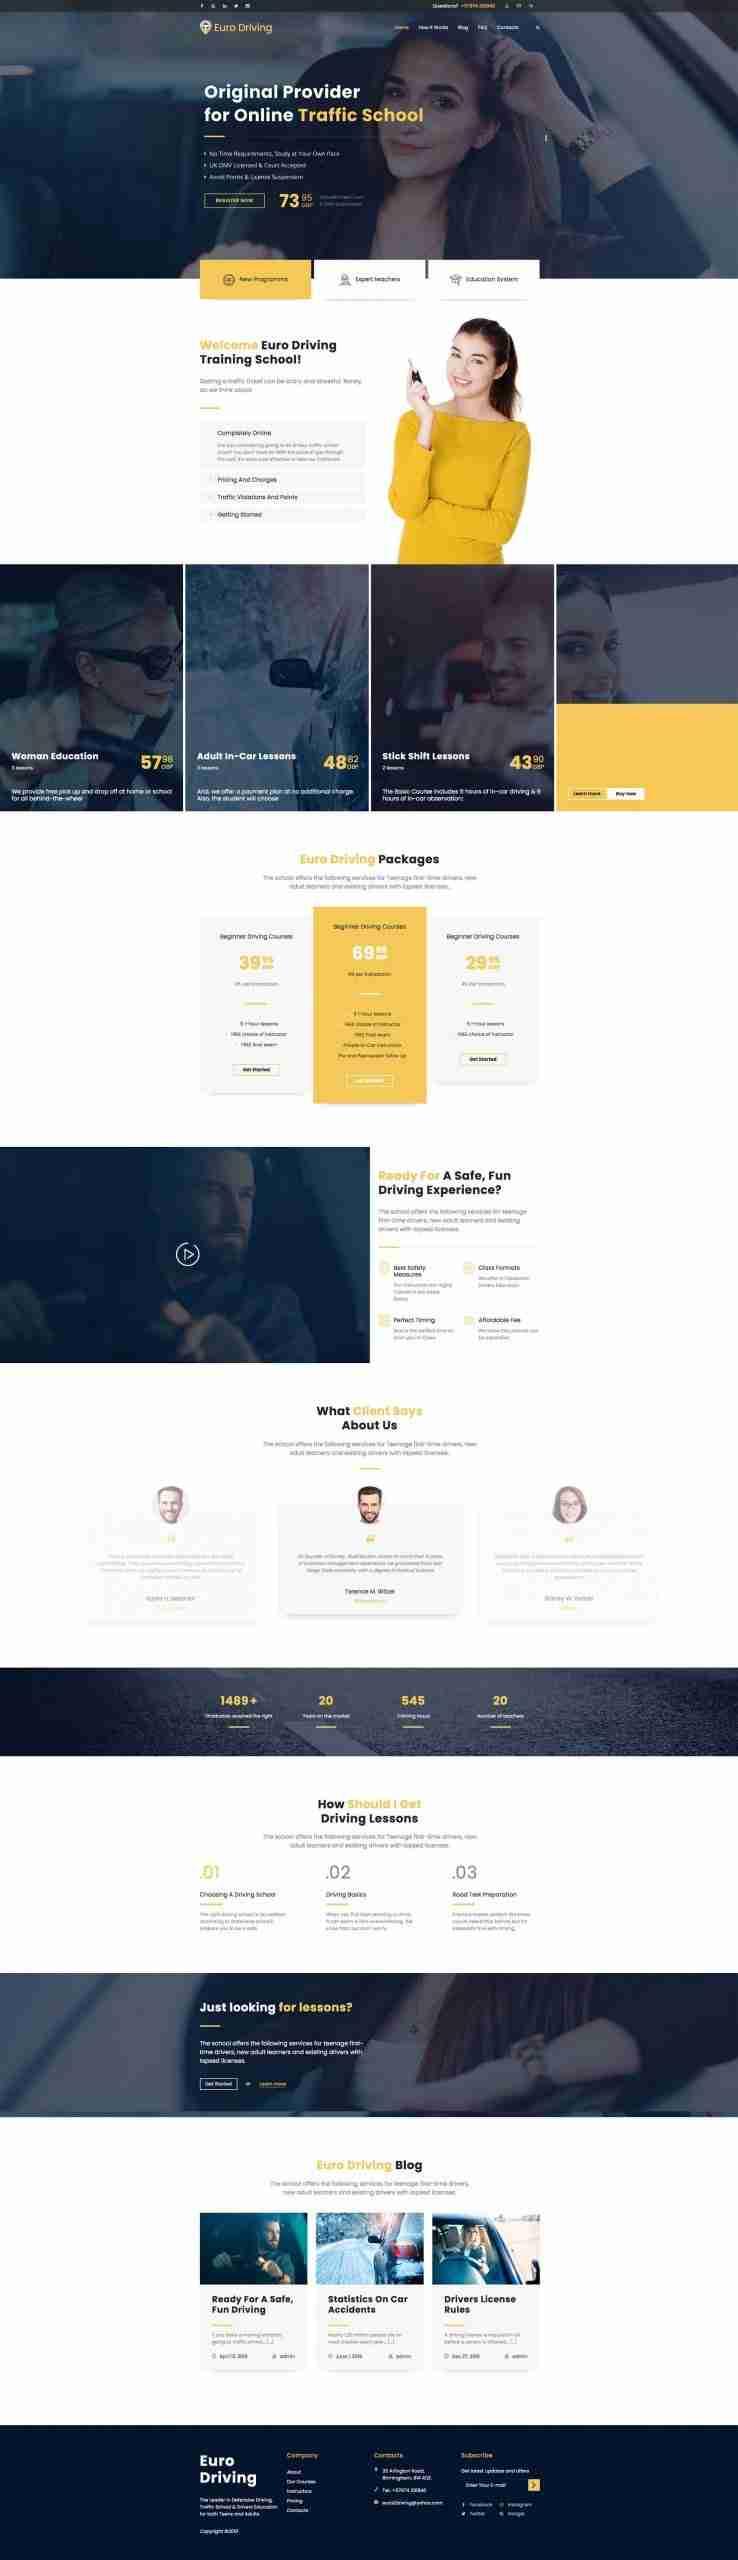 Web Design Website: Euro Driving